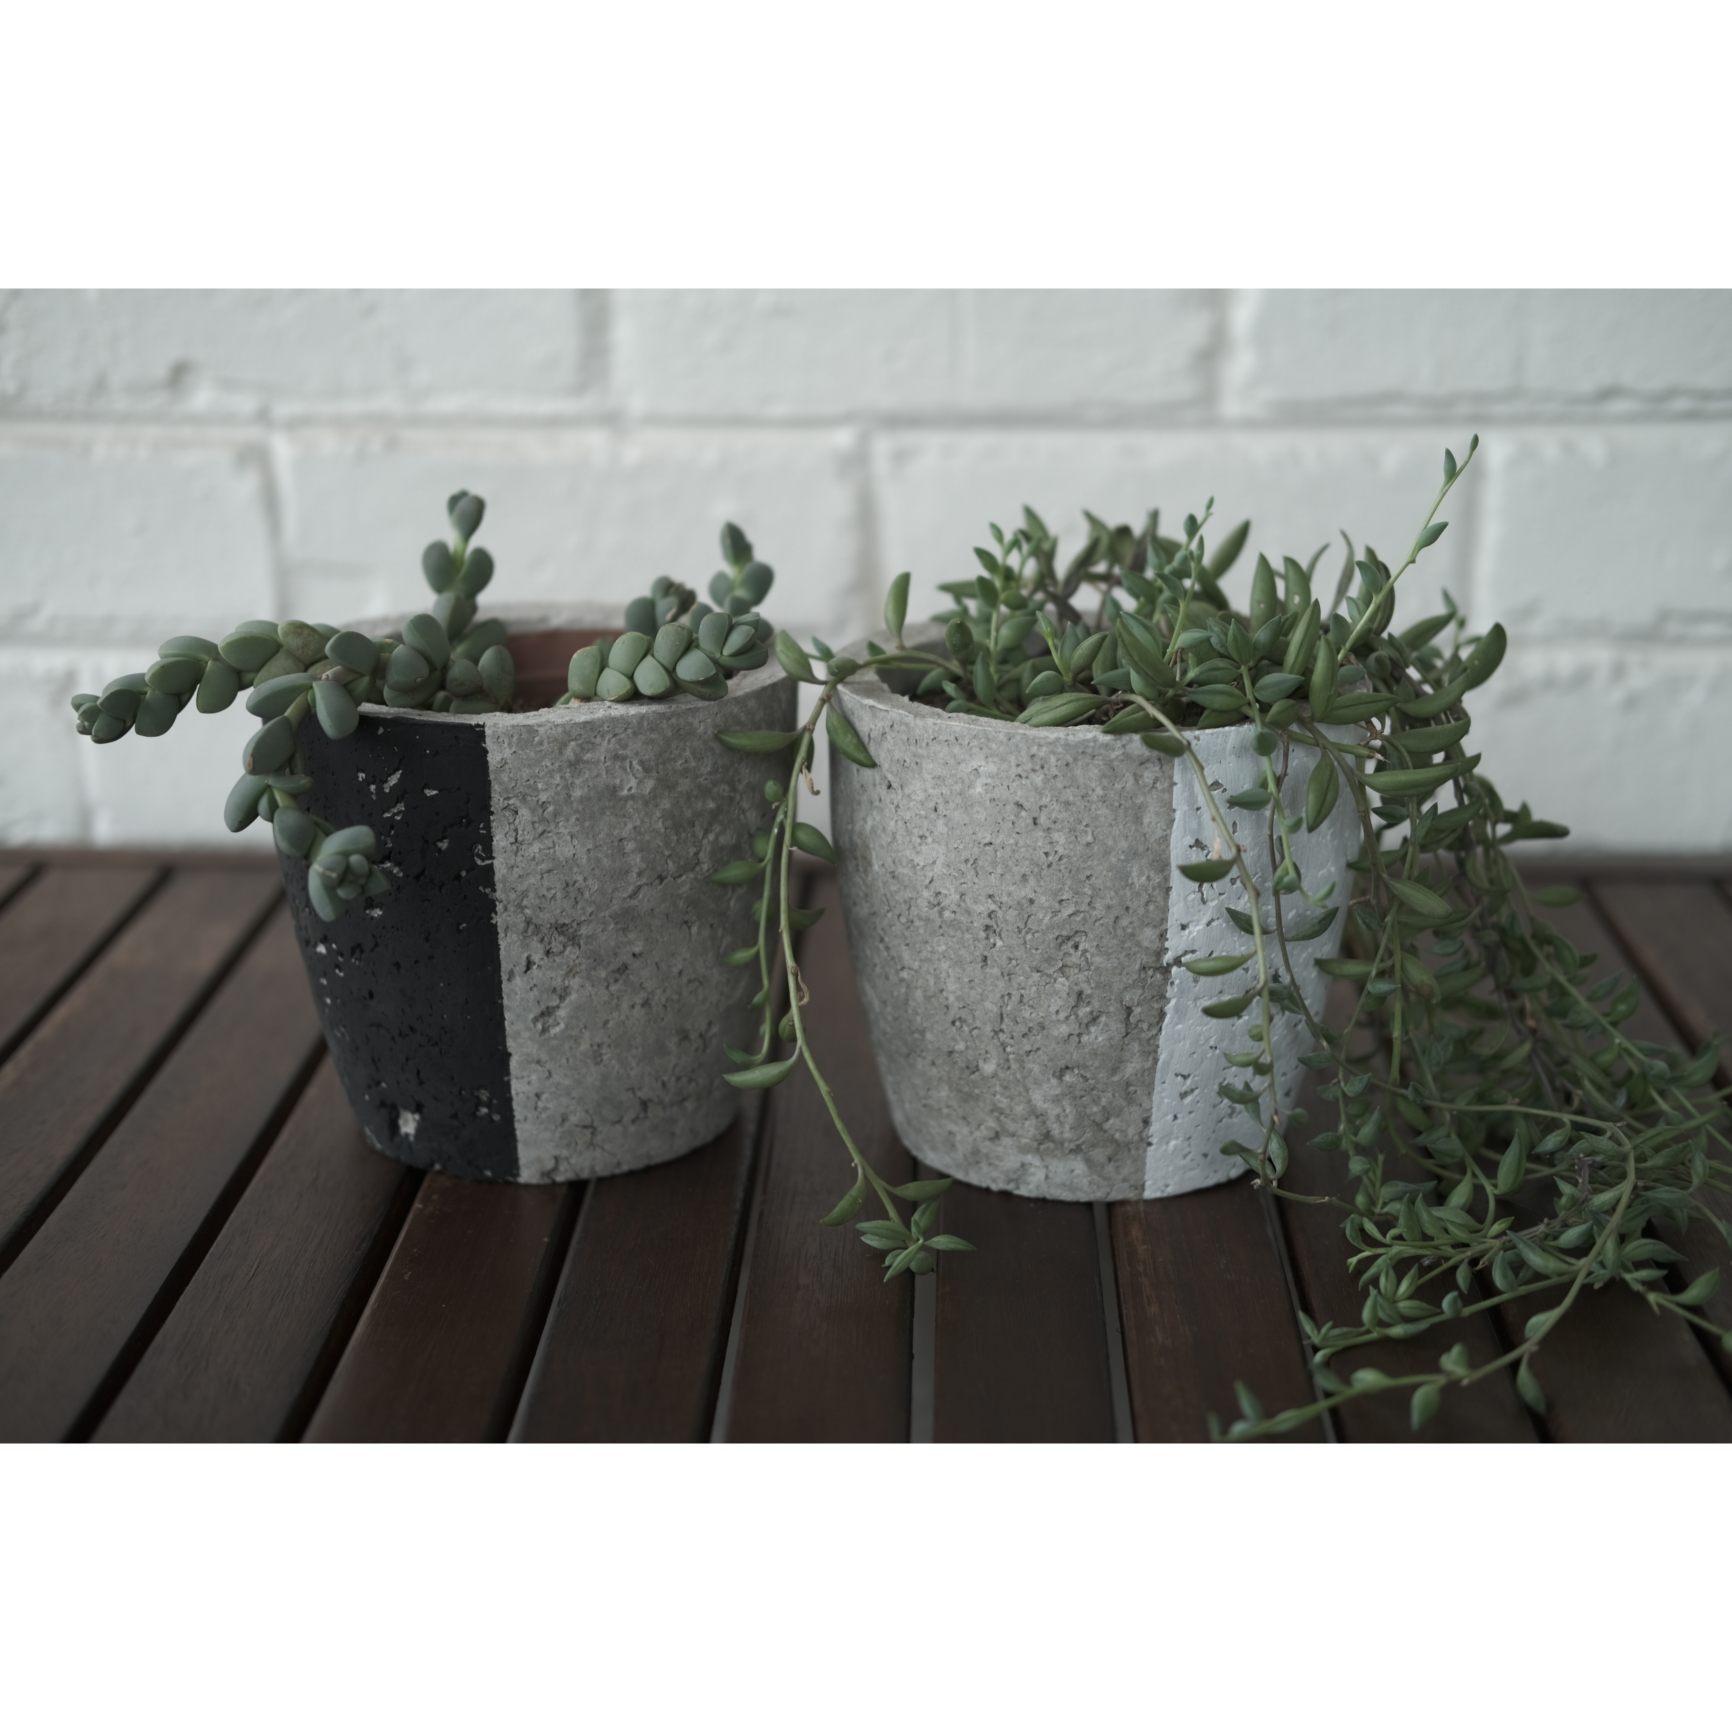 Plant pot set - black and white